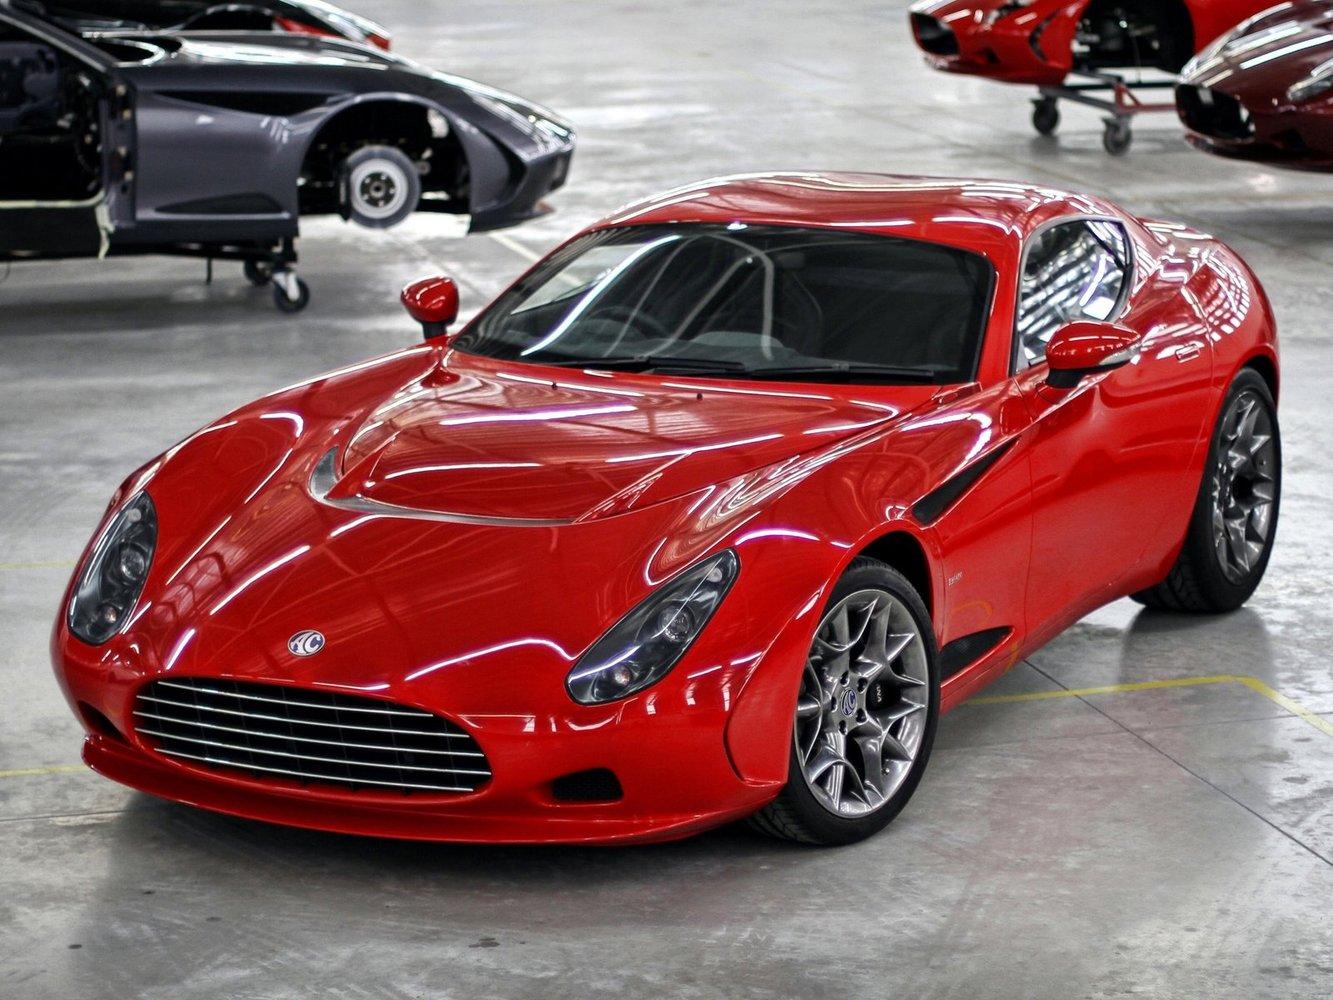 ac AC 378 GT Zagato